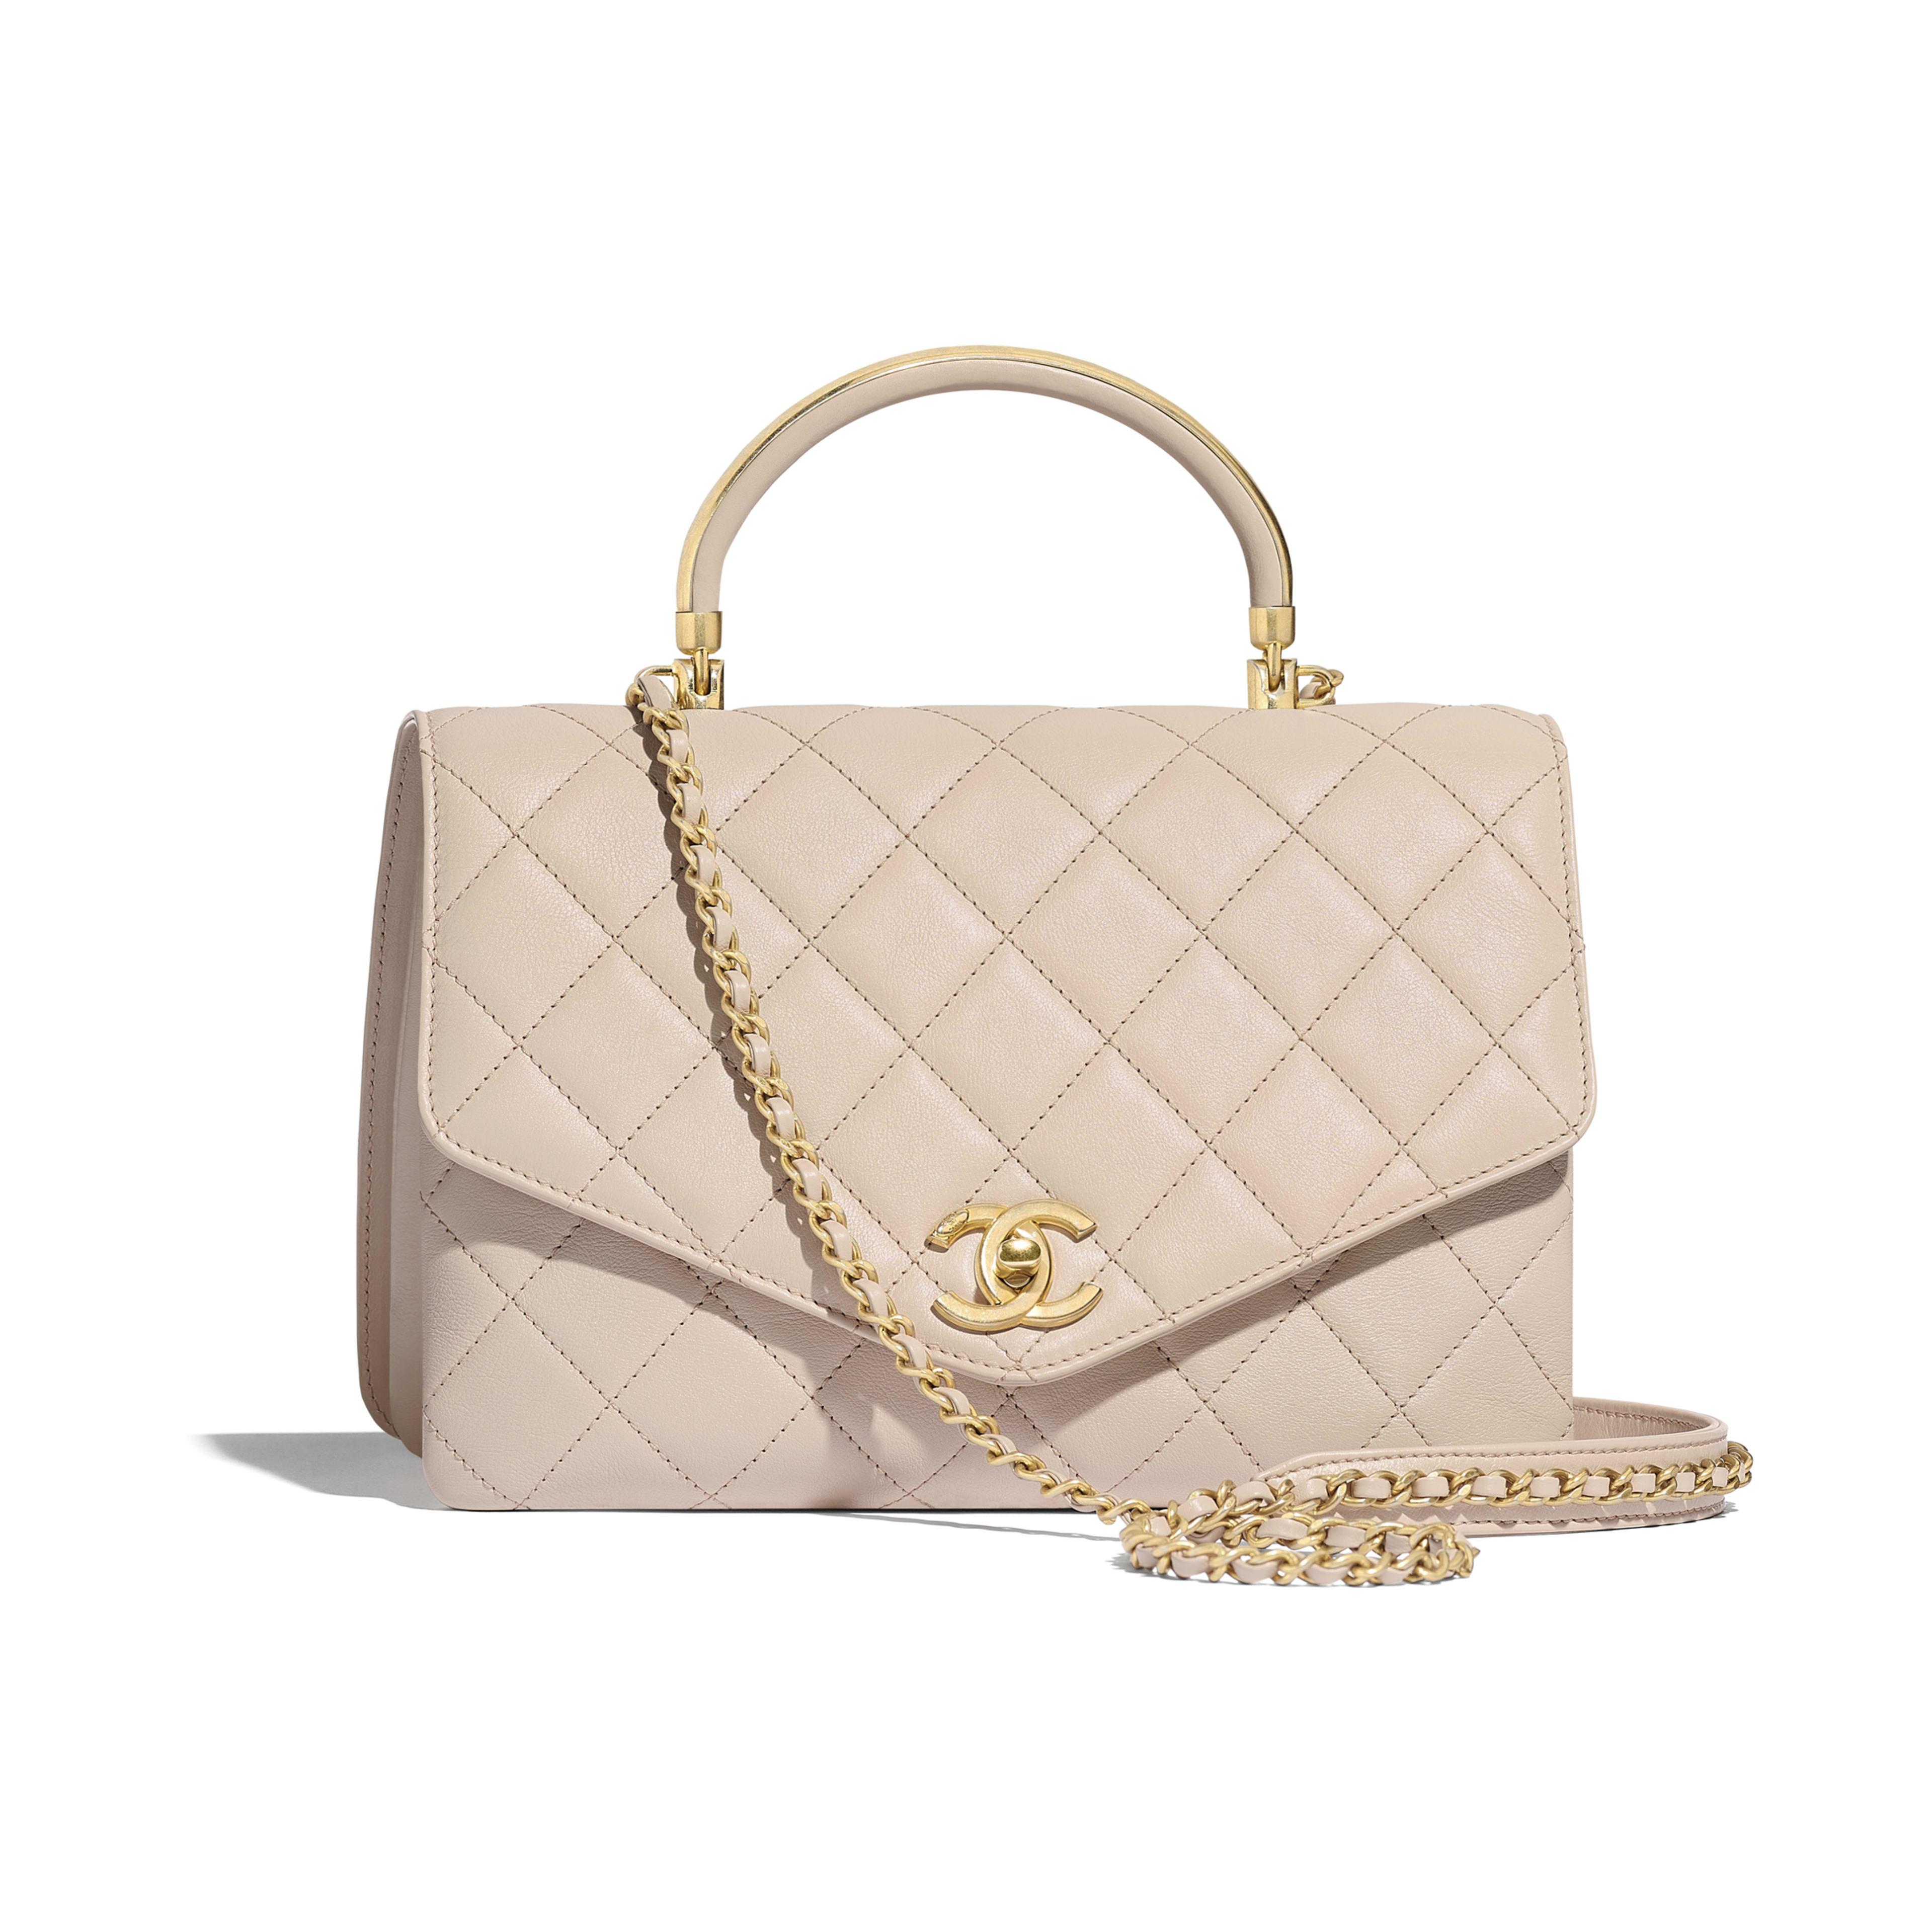 0bda387b58 Flap Bag with Top Handle - Beige - Calfskin   Gold-Tone Metal - Default ...